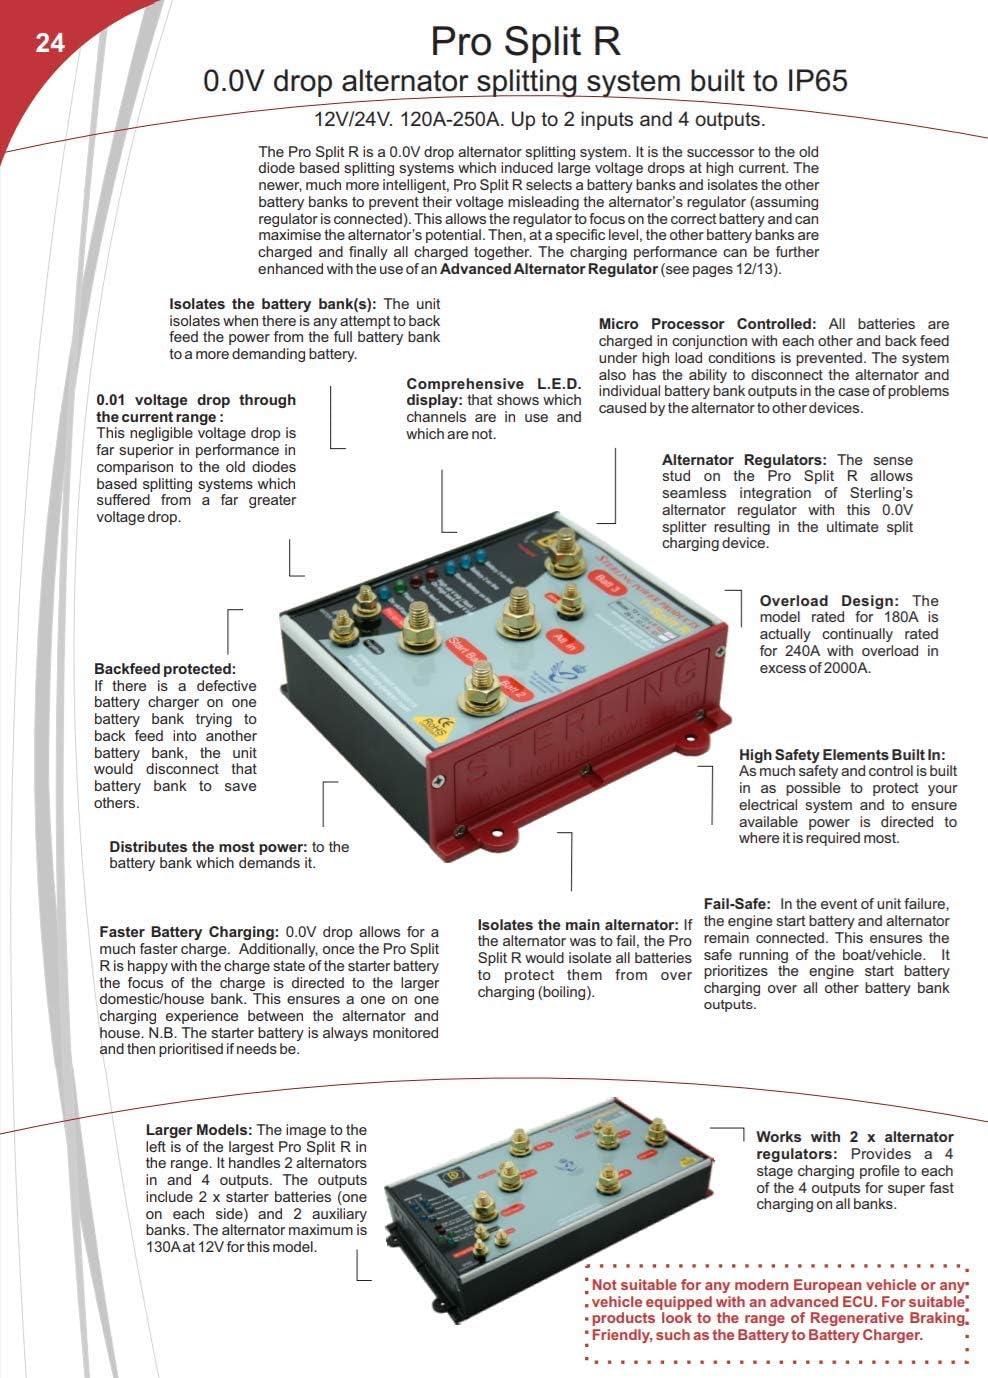 Sterling Pro Split R - Alternator 0.0V Drop Splitting System on rectifier wiring diagram, generator stator wiring diagram, alternator battery charging circuit, automatic choke wiring diagram, motorcraft alternators diagram, alternator conversion wiring harness, sensor wiring diagram, alternator regulator problems, alternator troubleshooting, windshield wiper switch wiring diagram, alternator voltage regulator schematic, alternator with external voltage regulator, distributor wiring diagram, alternator diode wiring, alternator wiring schematic, battery wiring diagram, gy6 rectifier diagram, alternator and regulator wiring, alternator voltage regulator test, alternator wiring problems,